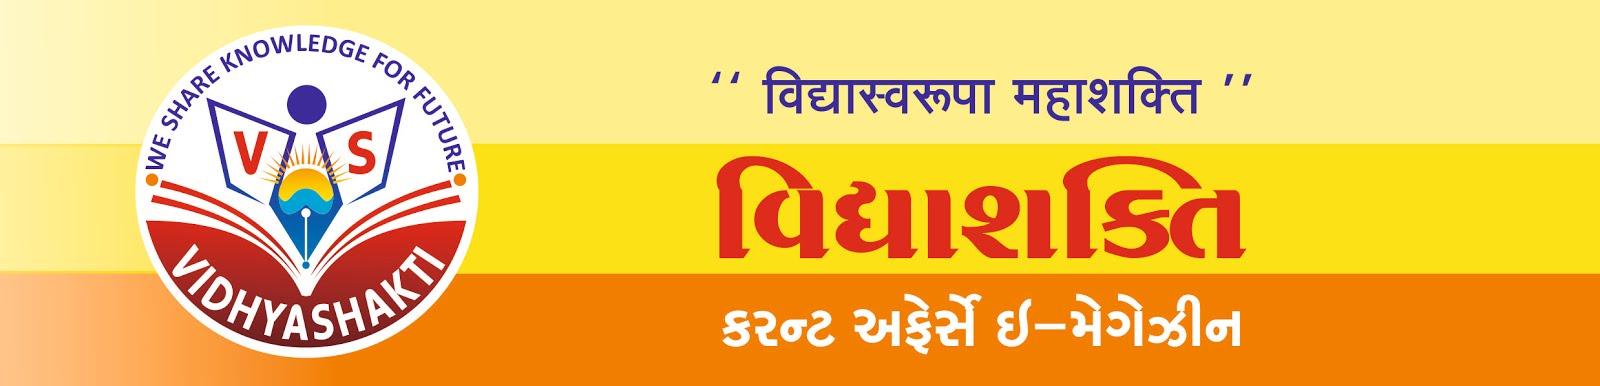 vidhyashakti